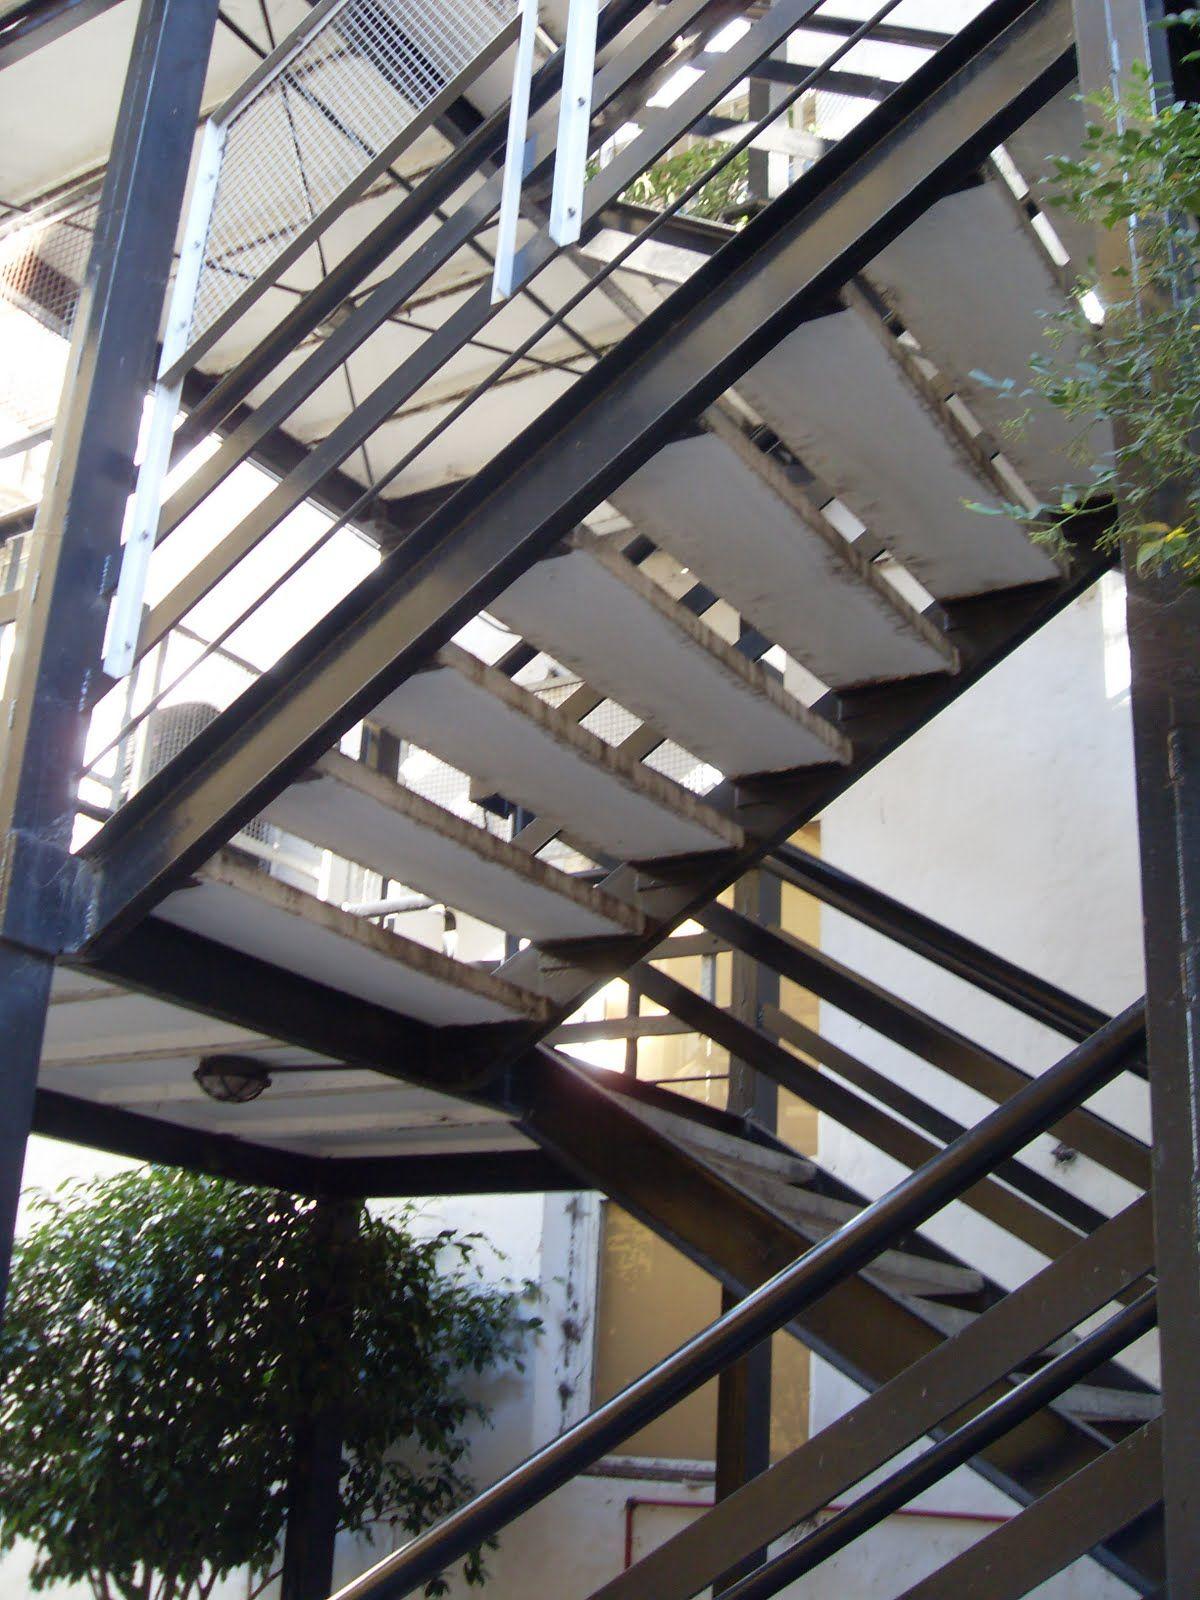 Escaleras metalicas detalle tecnico buscar con google for Formula escalera